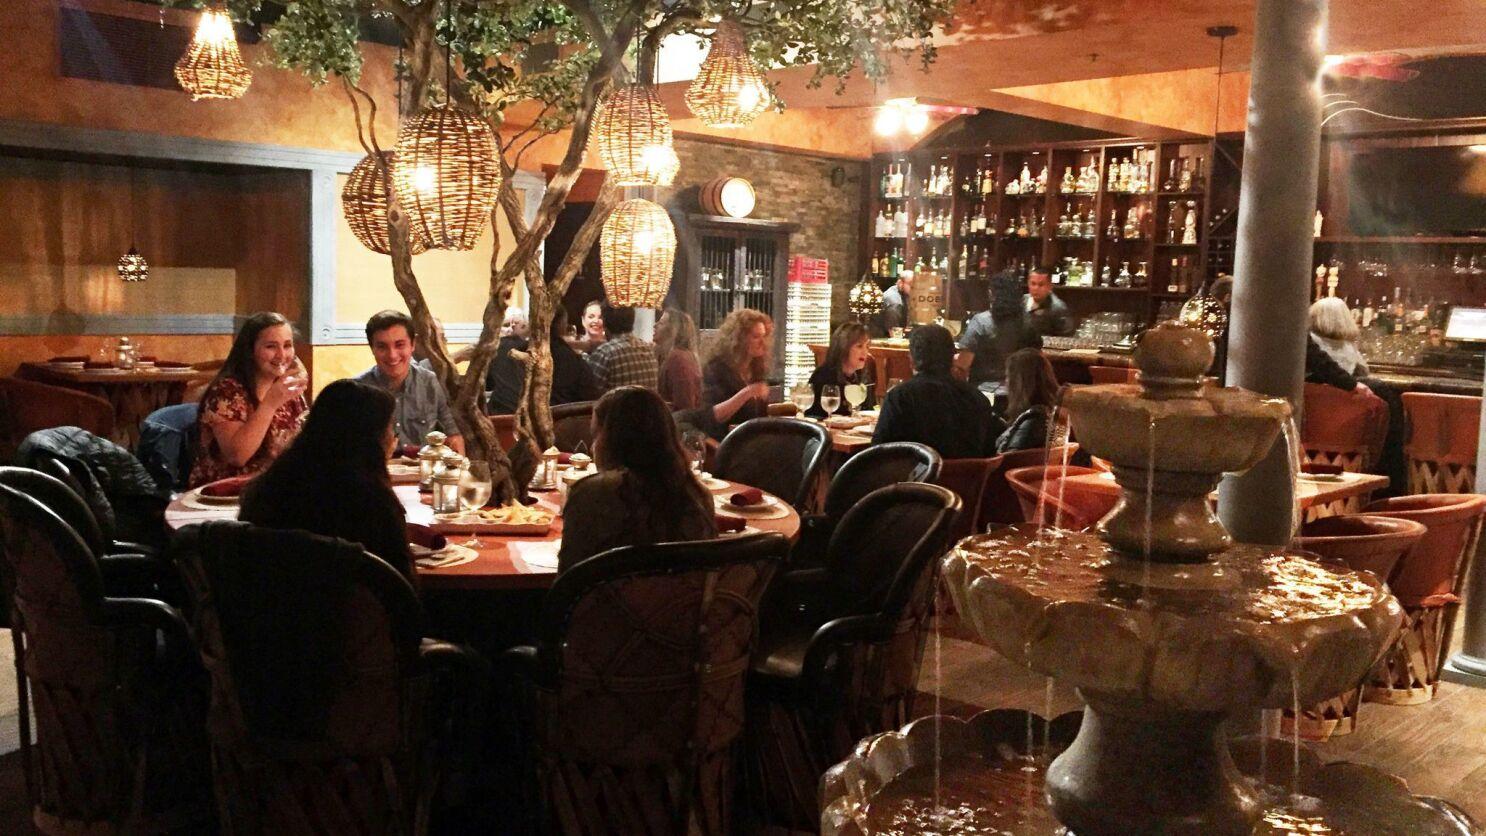 Hacienda de Vega family back with new restaurant - The San Diego